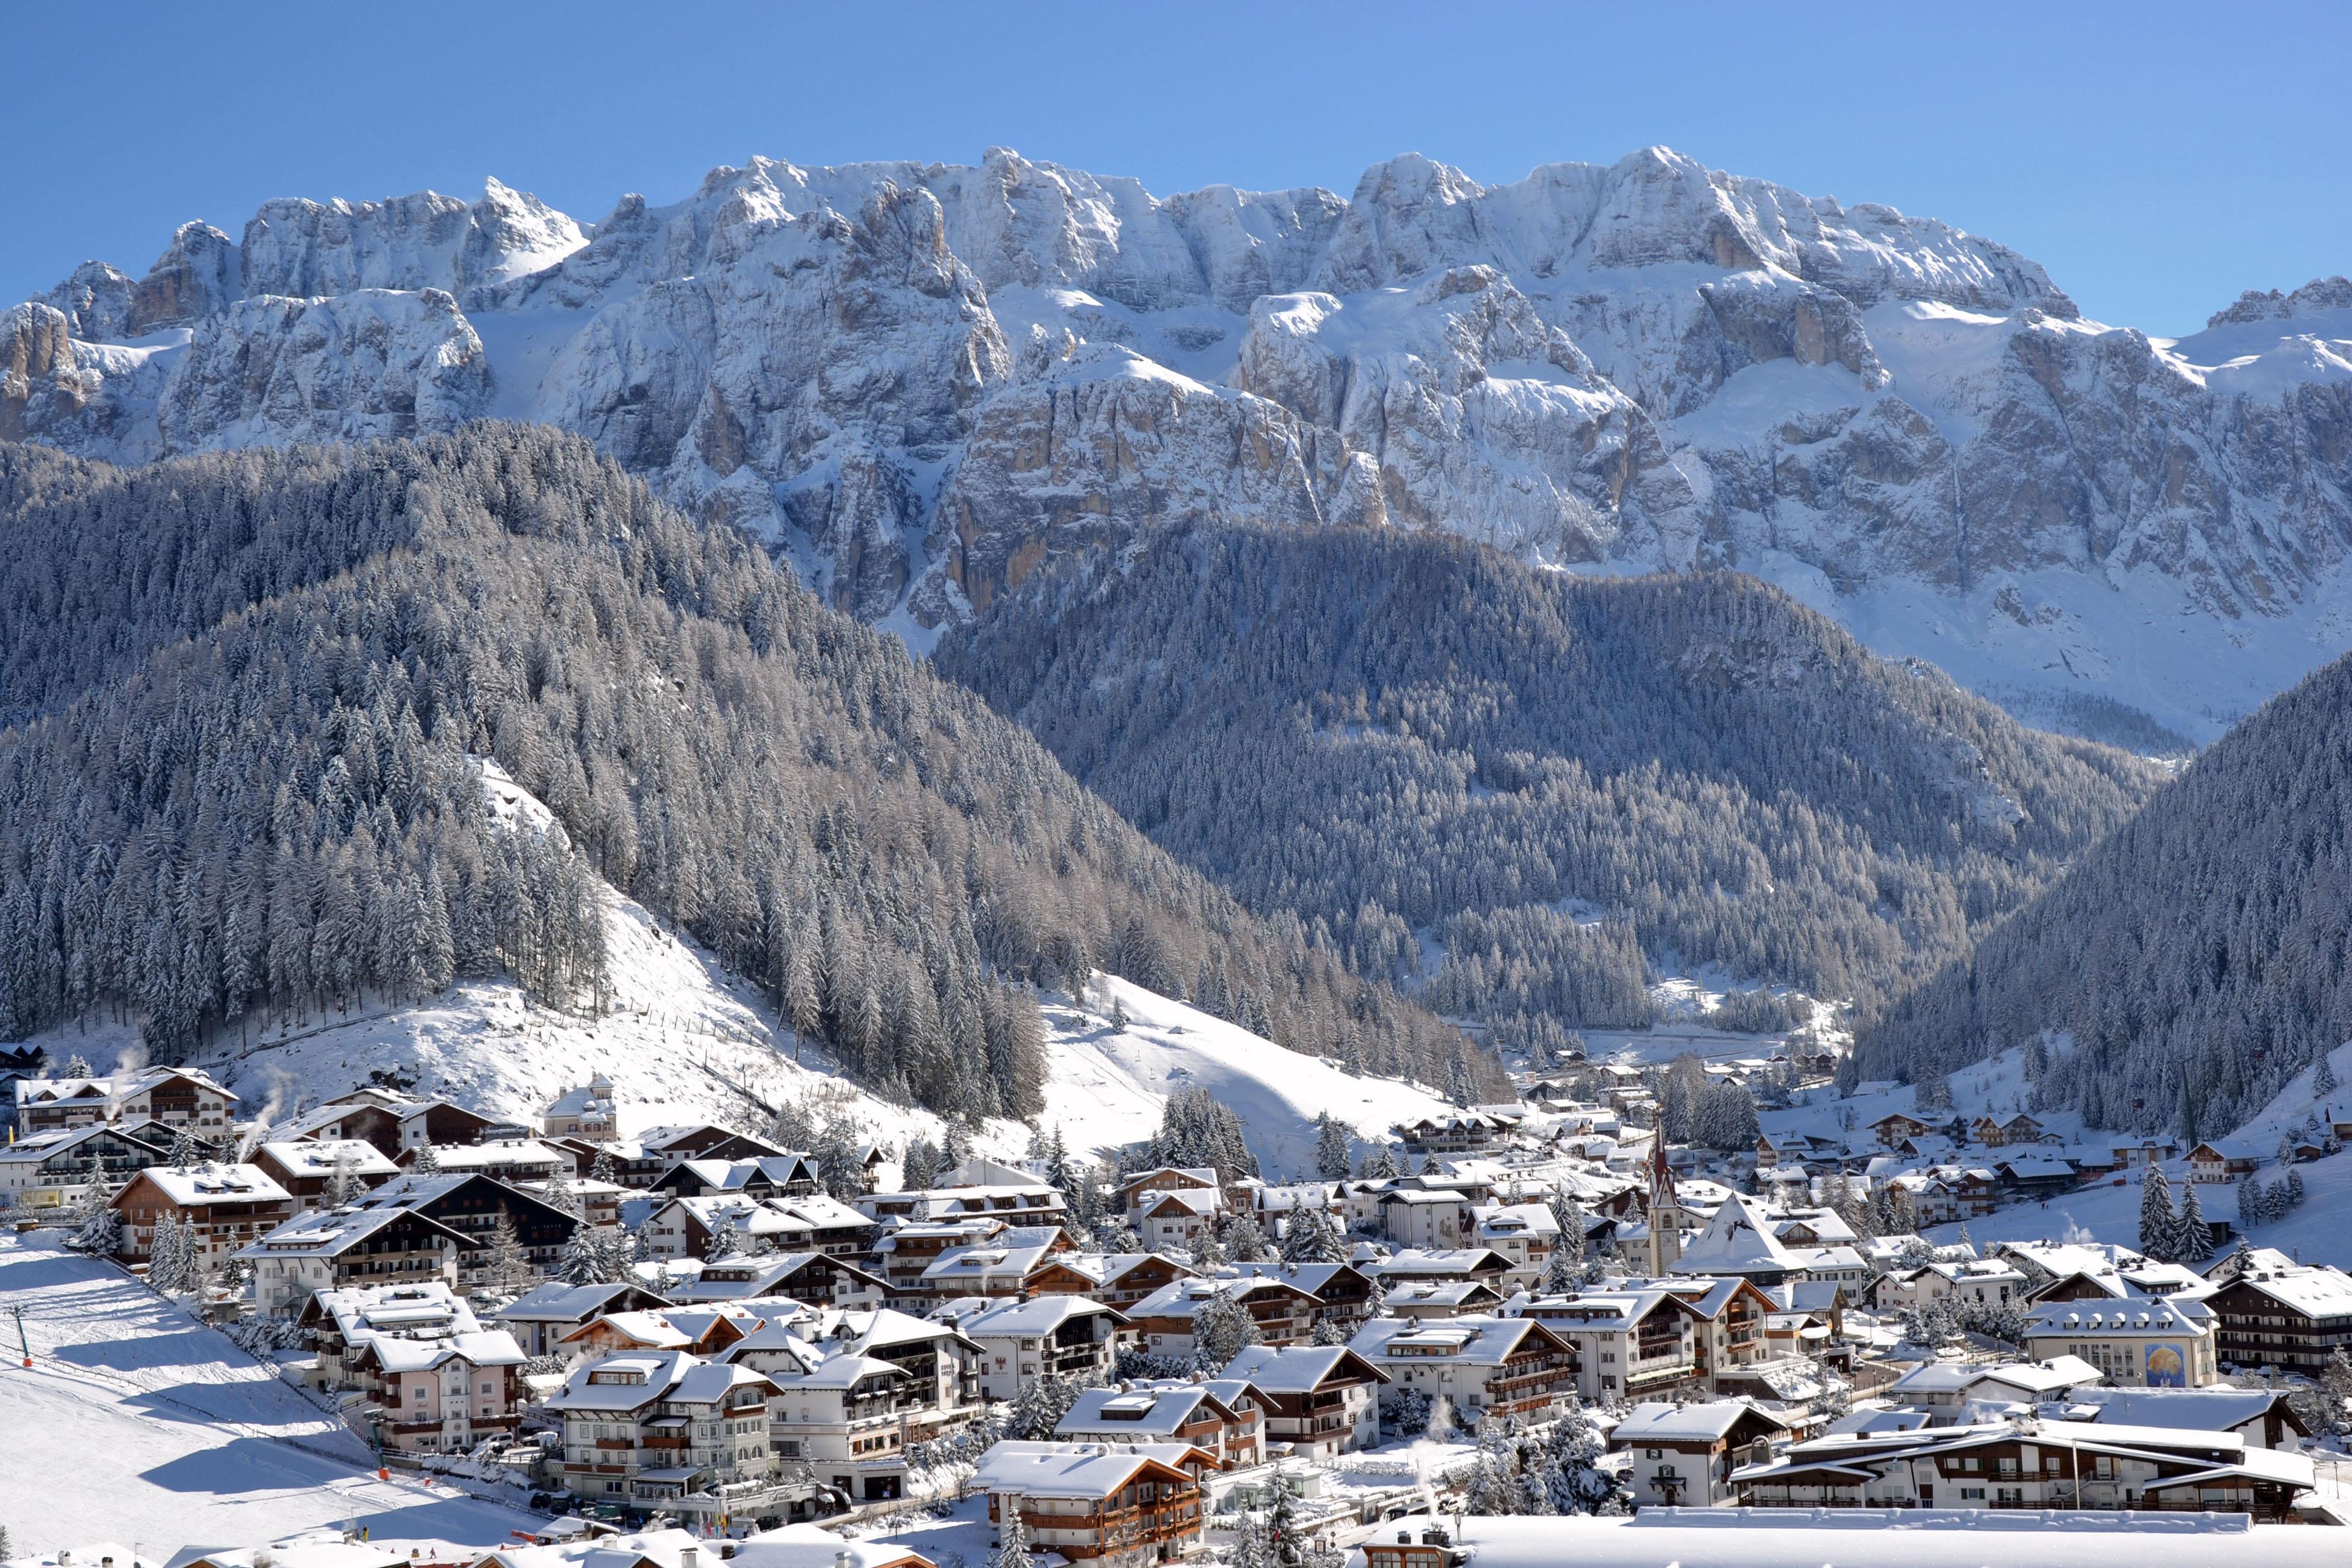 Torna la neve sulle montagne